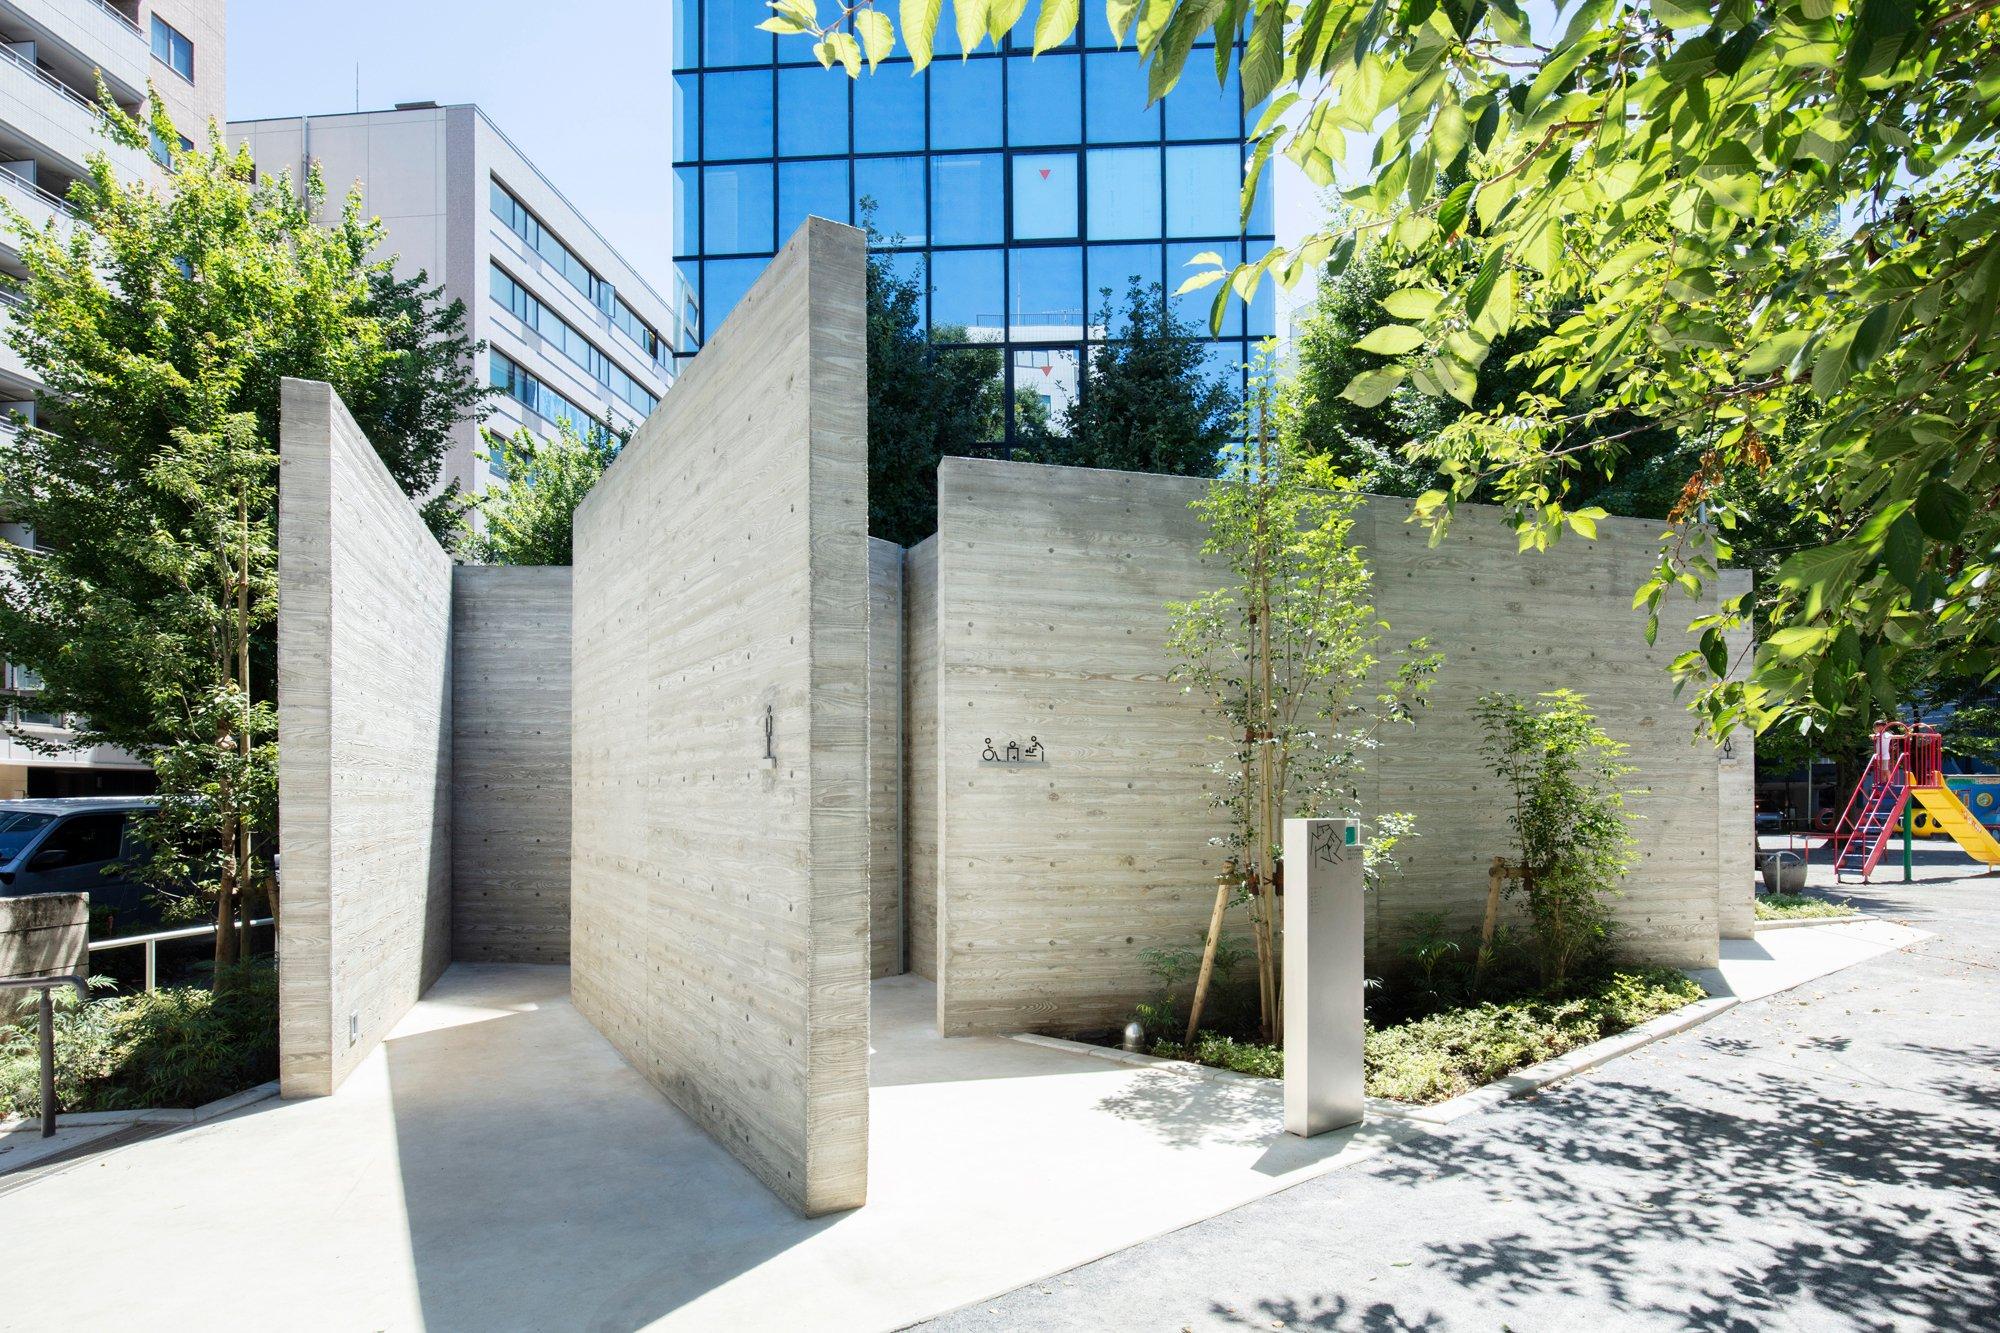 The Tokyo Toiletim Ebisu Park von Masamichi Katayama und seinem Büro Wonderwall. Foto: Satoshi Nagare / The Nippon Foundation